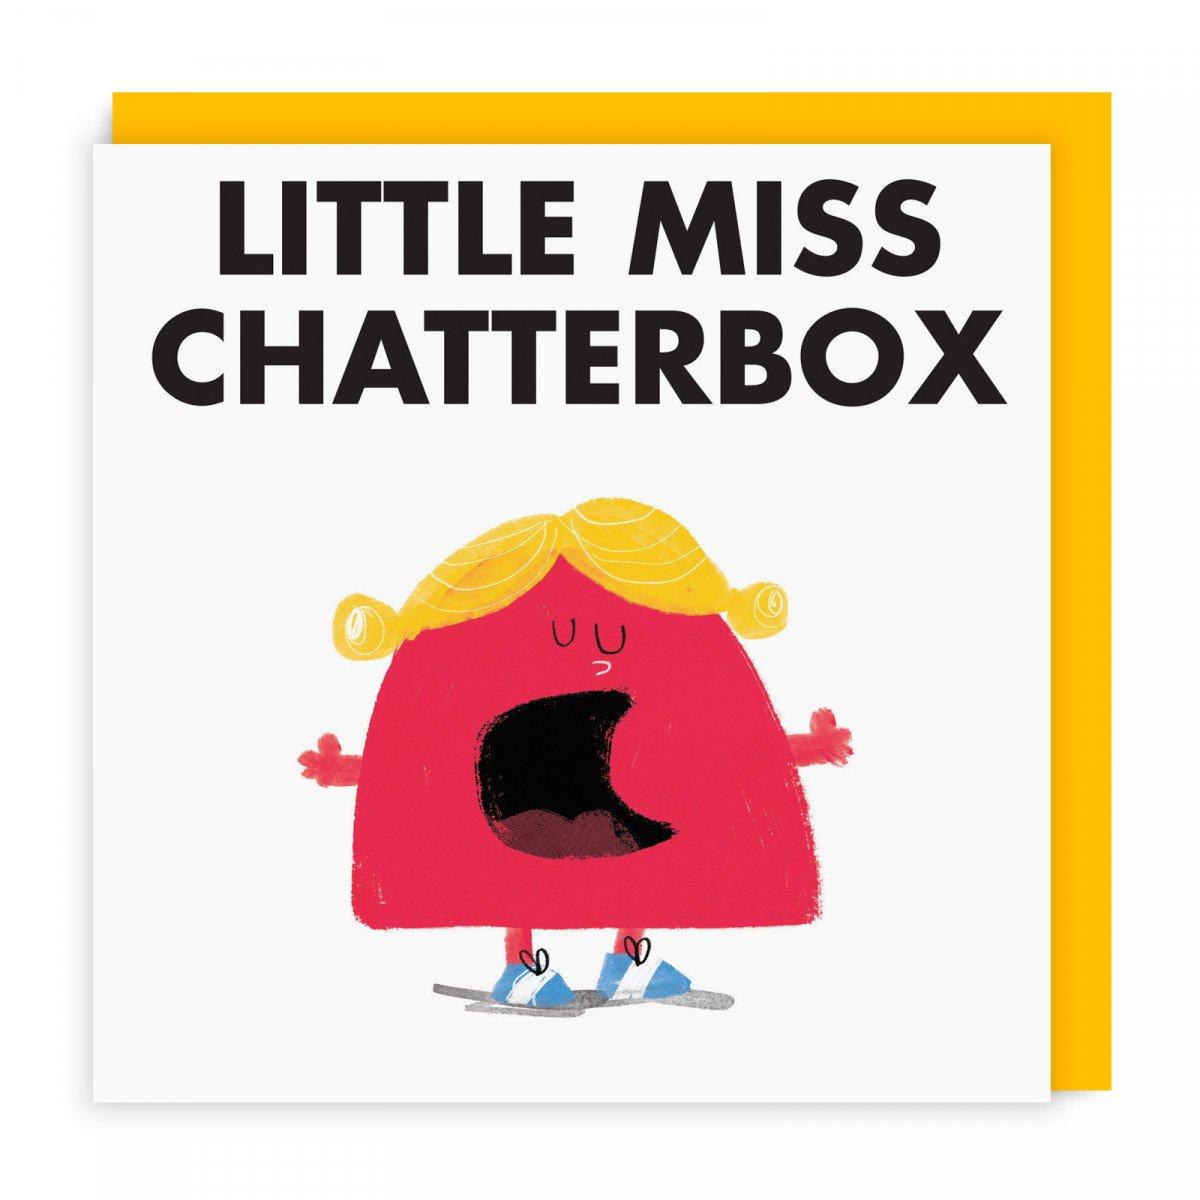 mmlm-gc-002-sq_little_miss_chatterbox_2.jpg